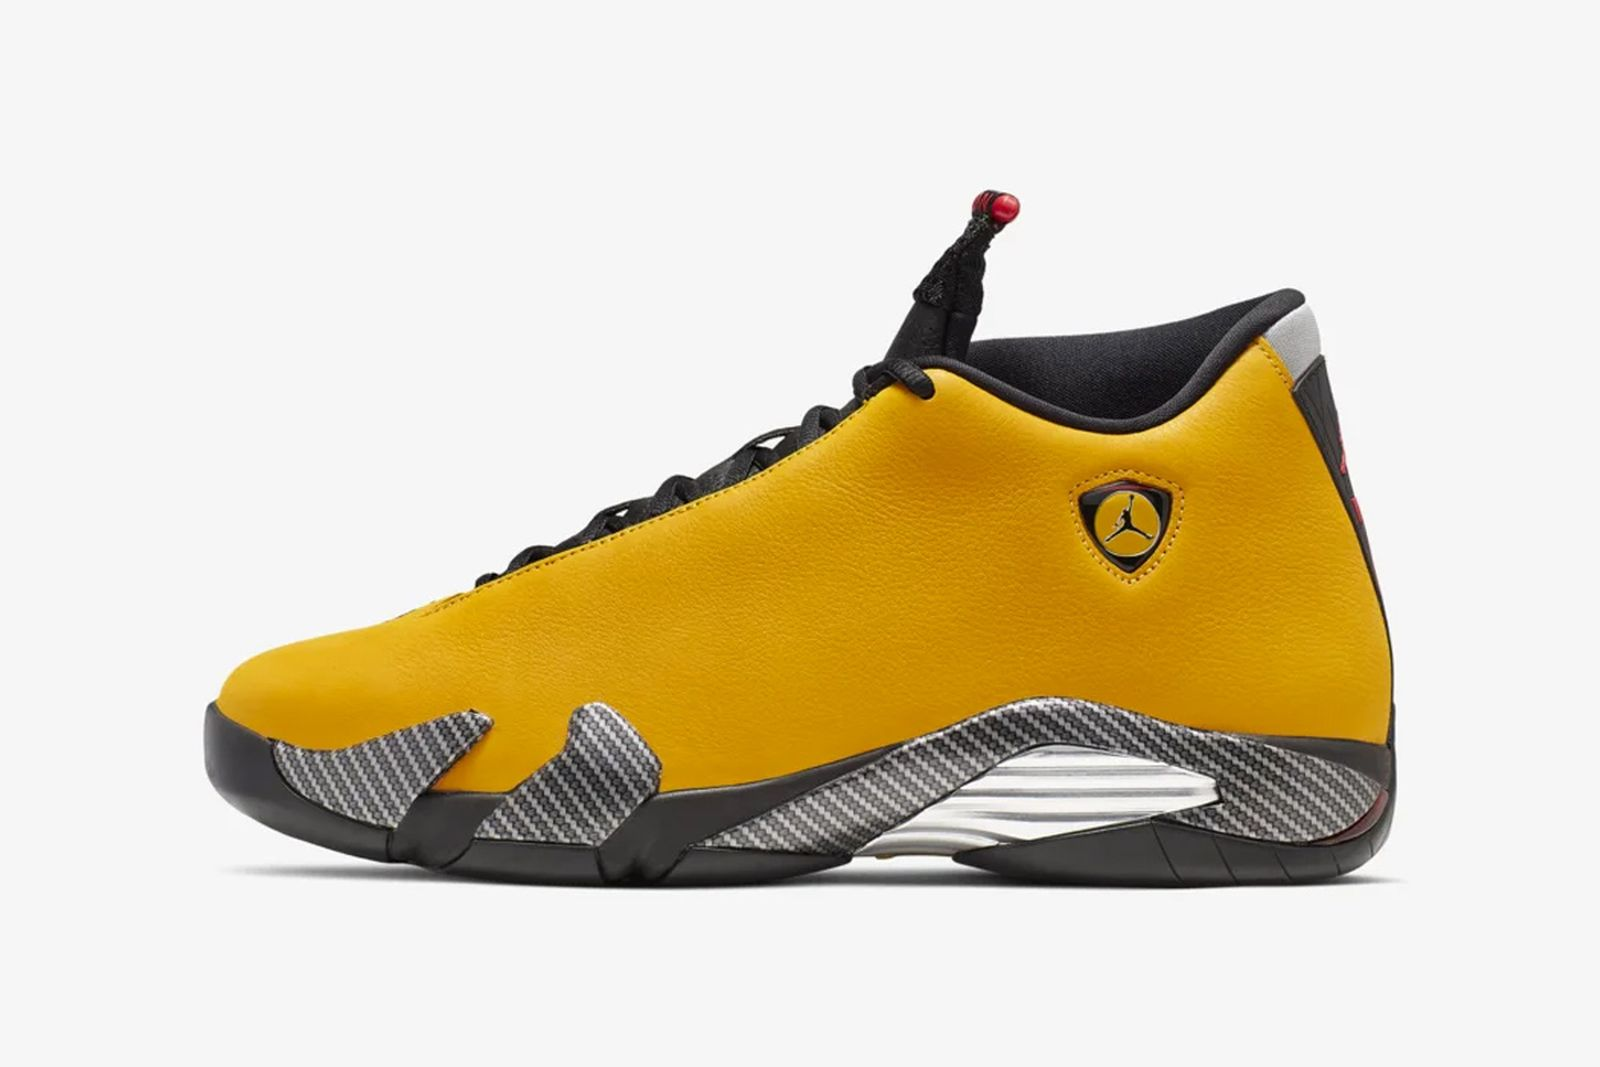 Nike Air Jordan 14 Reverse Ferrari Where To Buy This Week